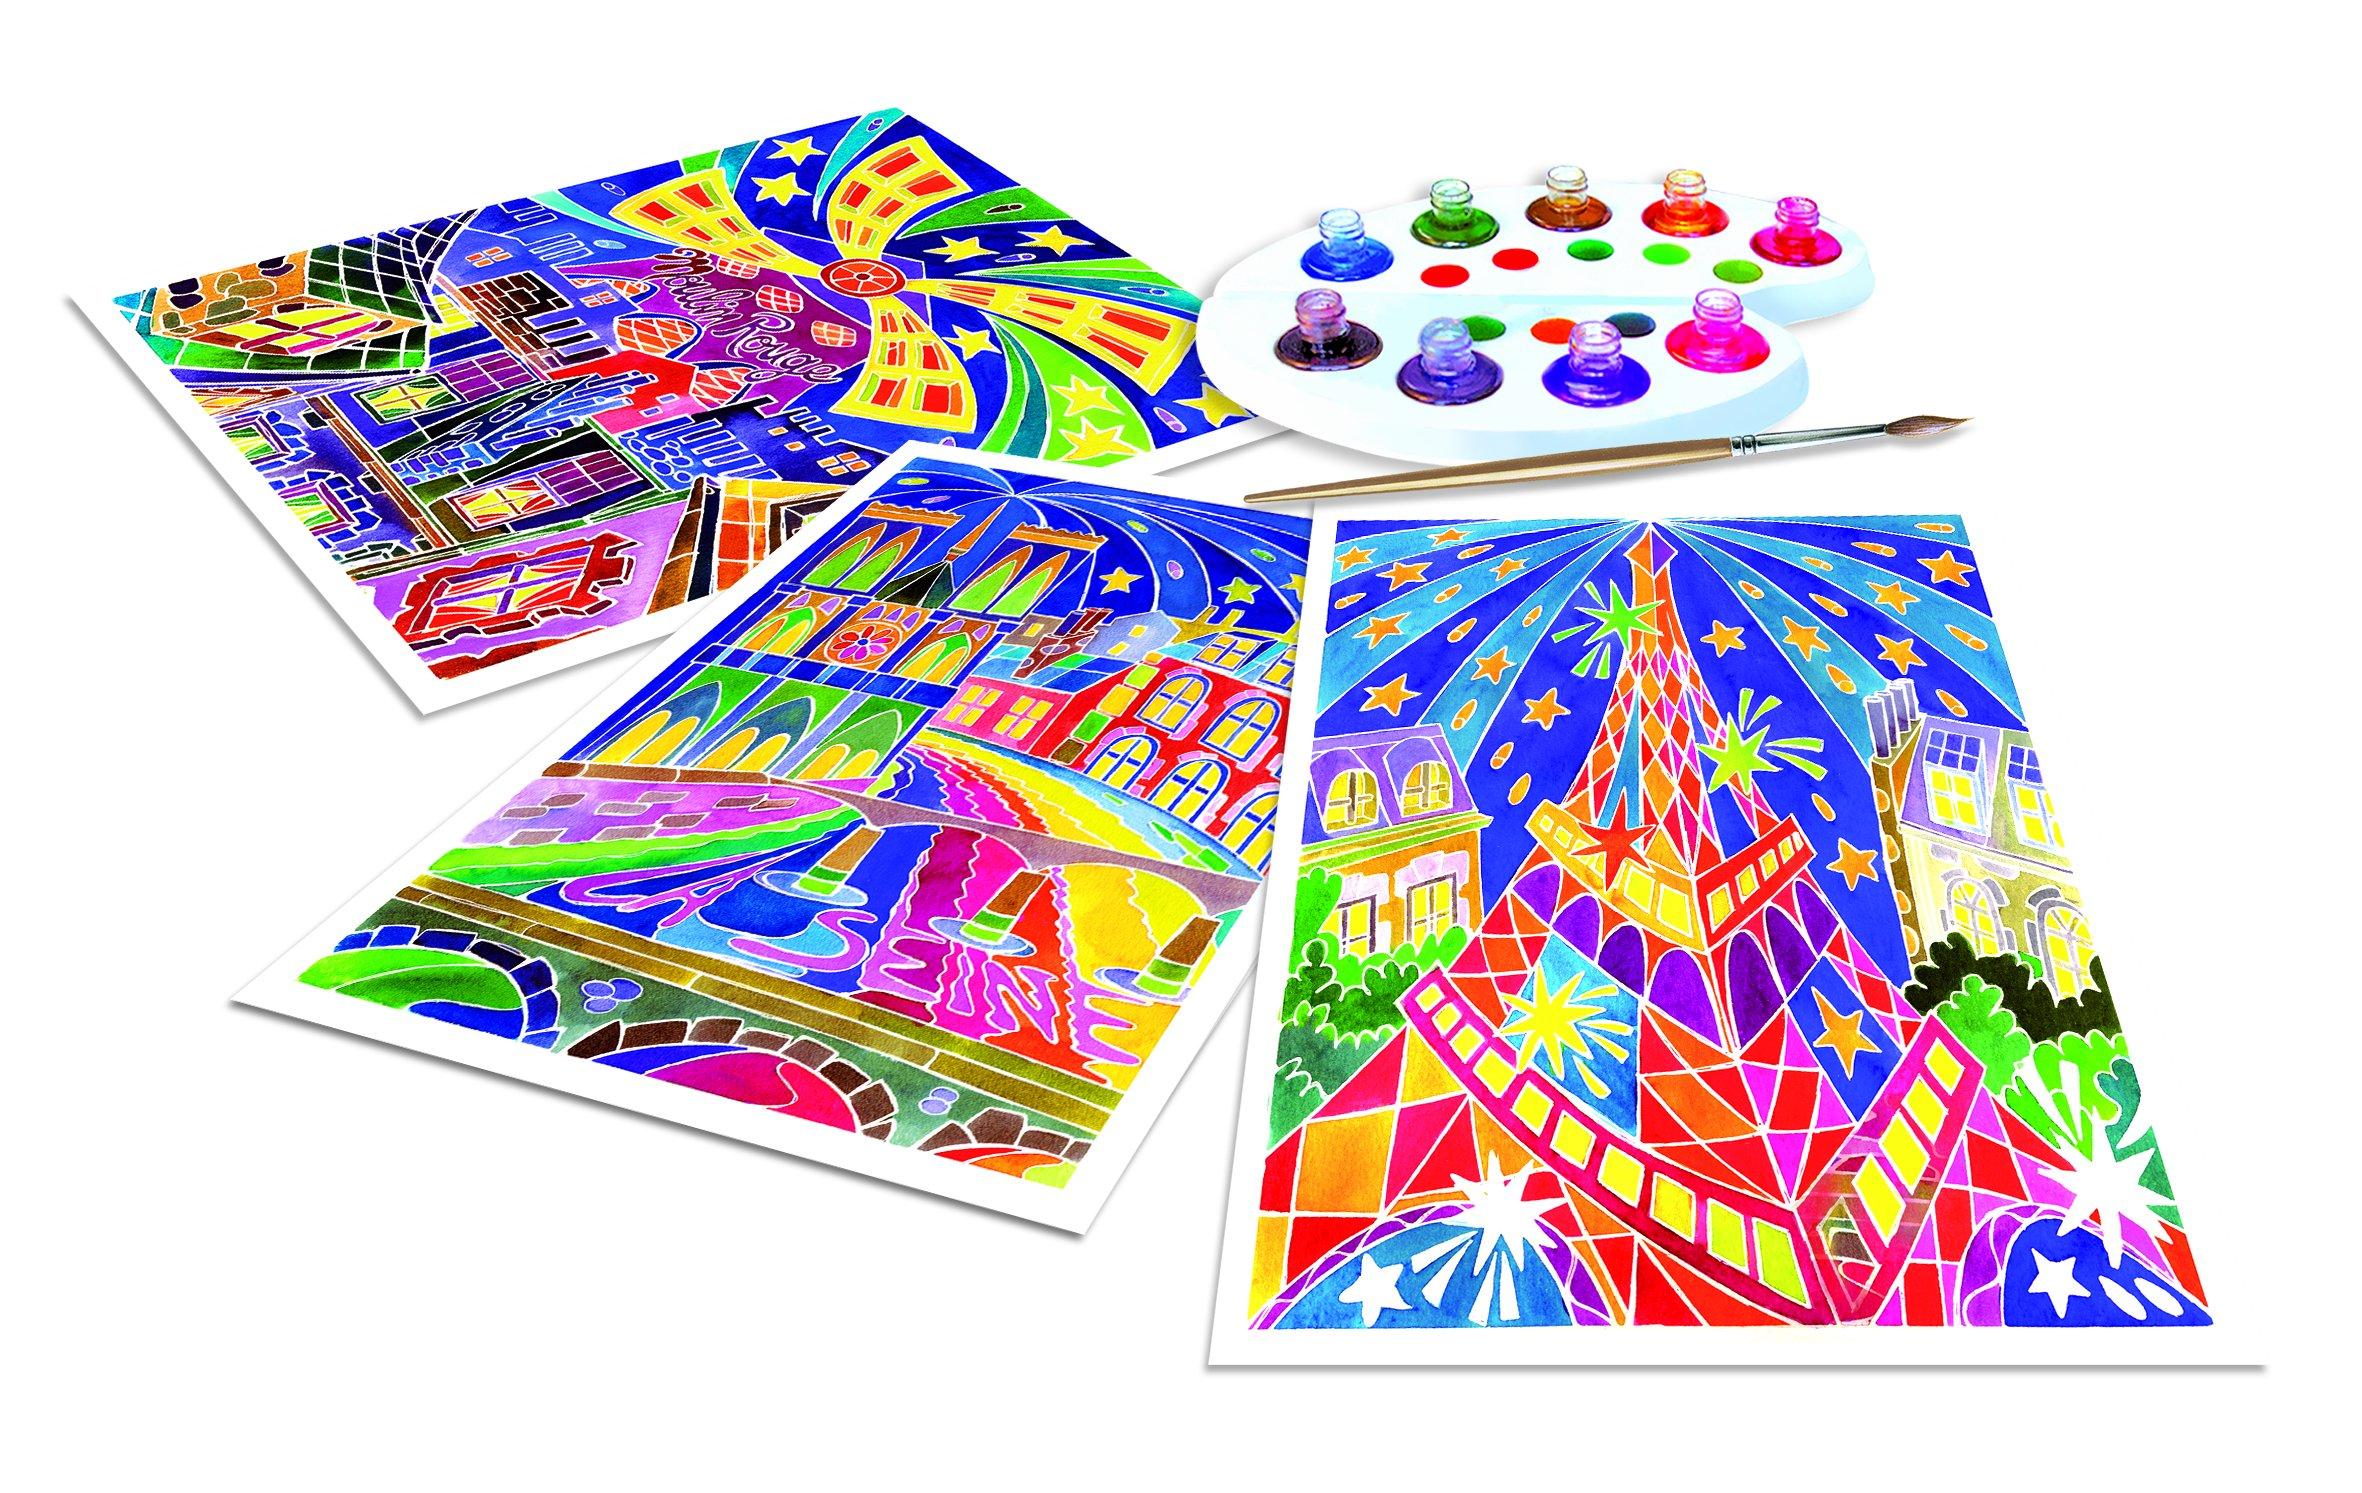 SentoSphere Aquarellum - Paris by Night - Arts and Crafts Watercolor Paint Set